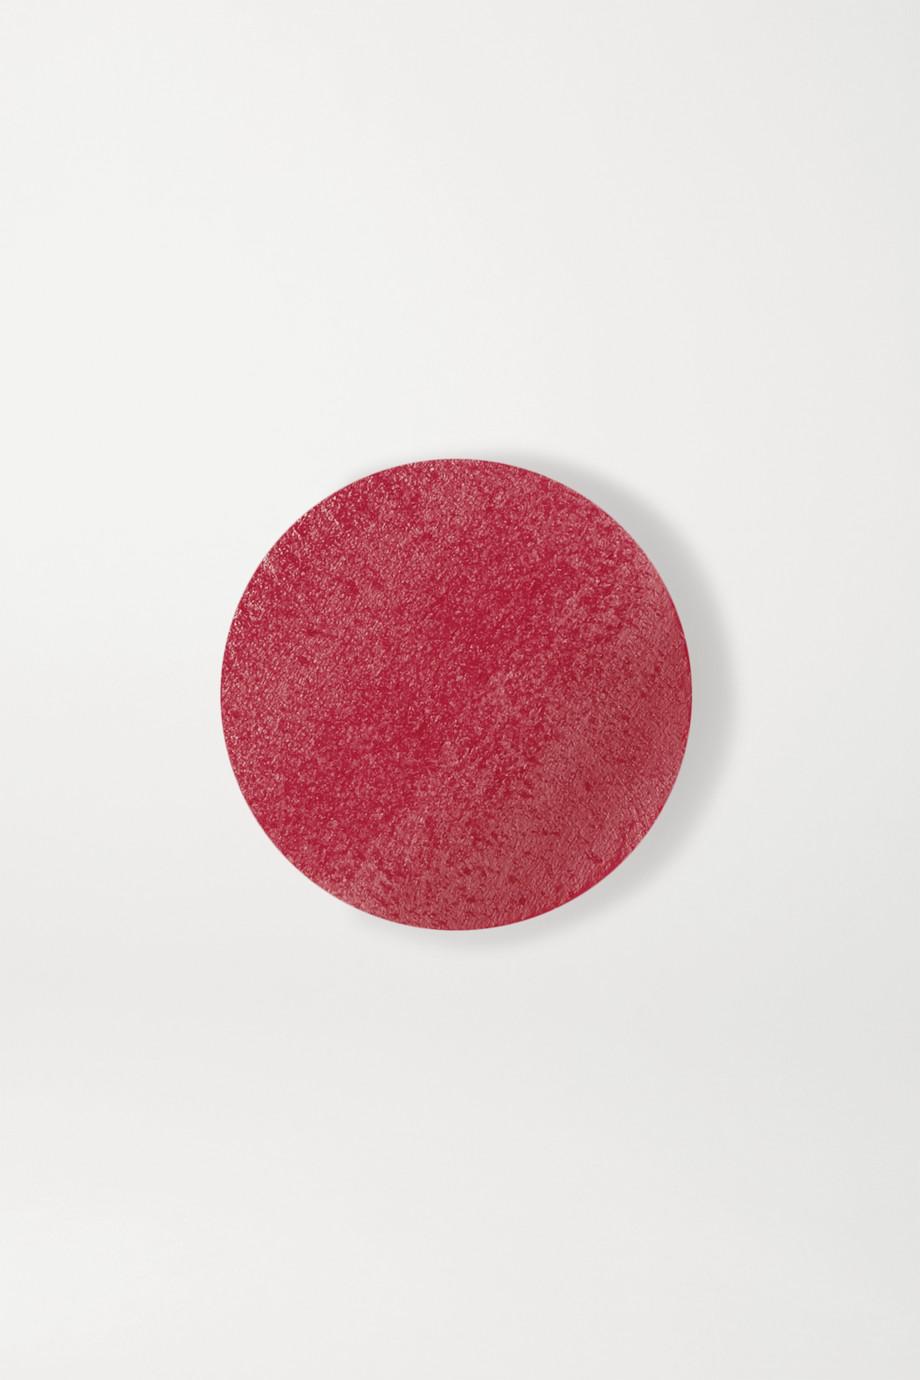 La Bouche Rouge Satin Lipstick Refill - Burgundy